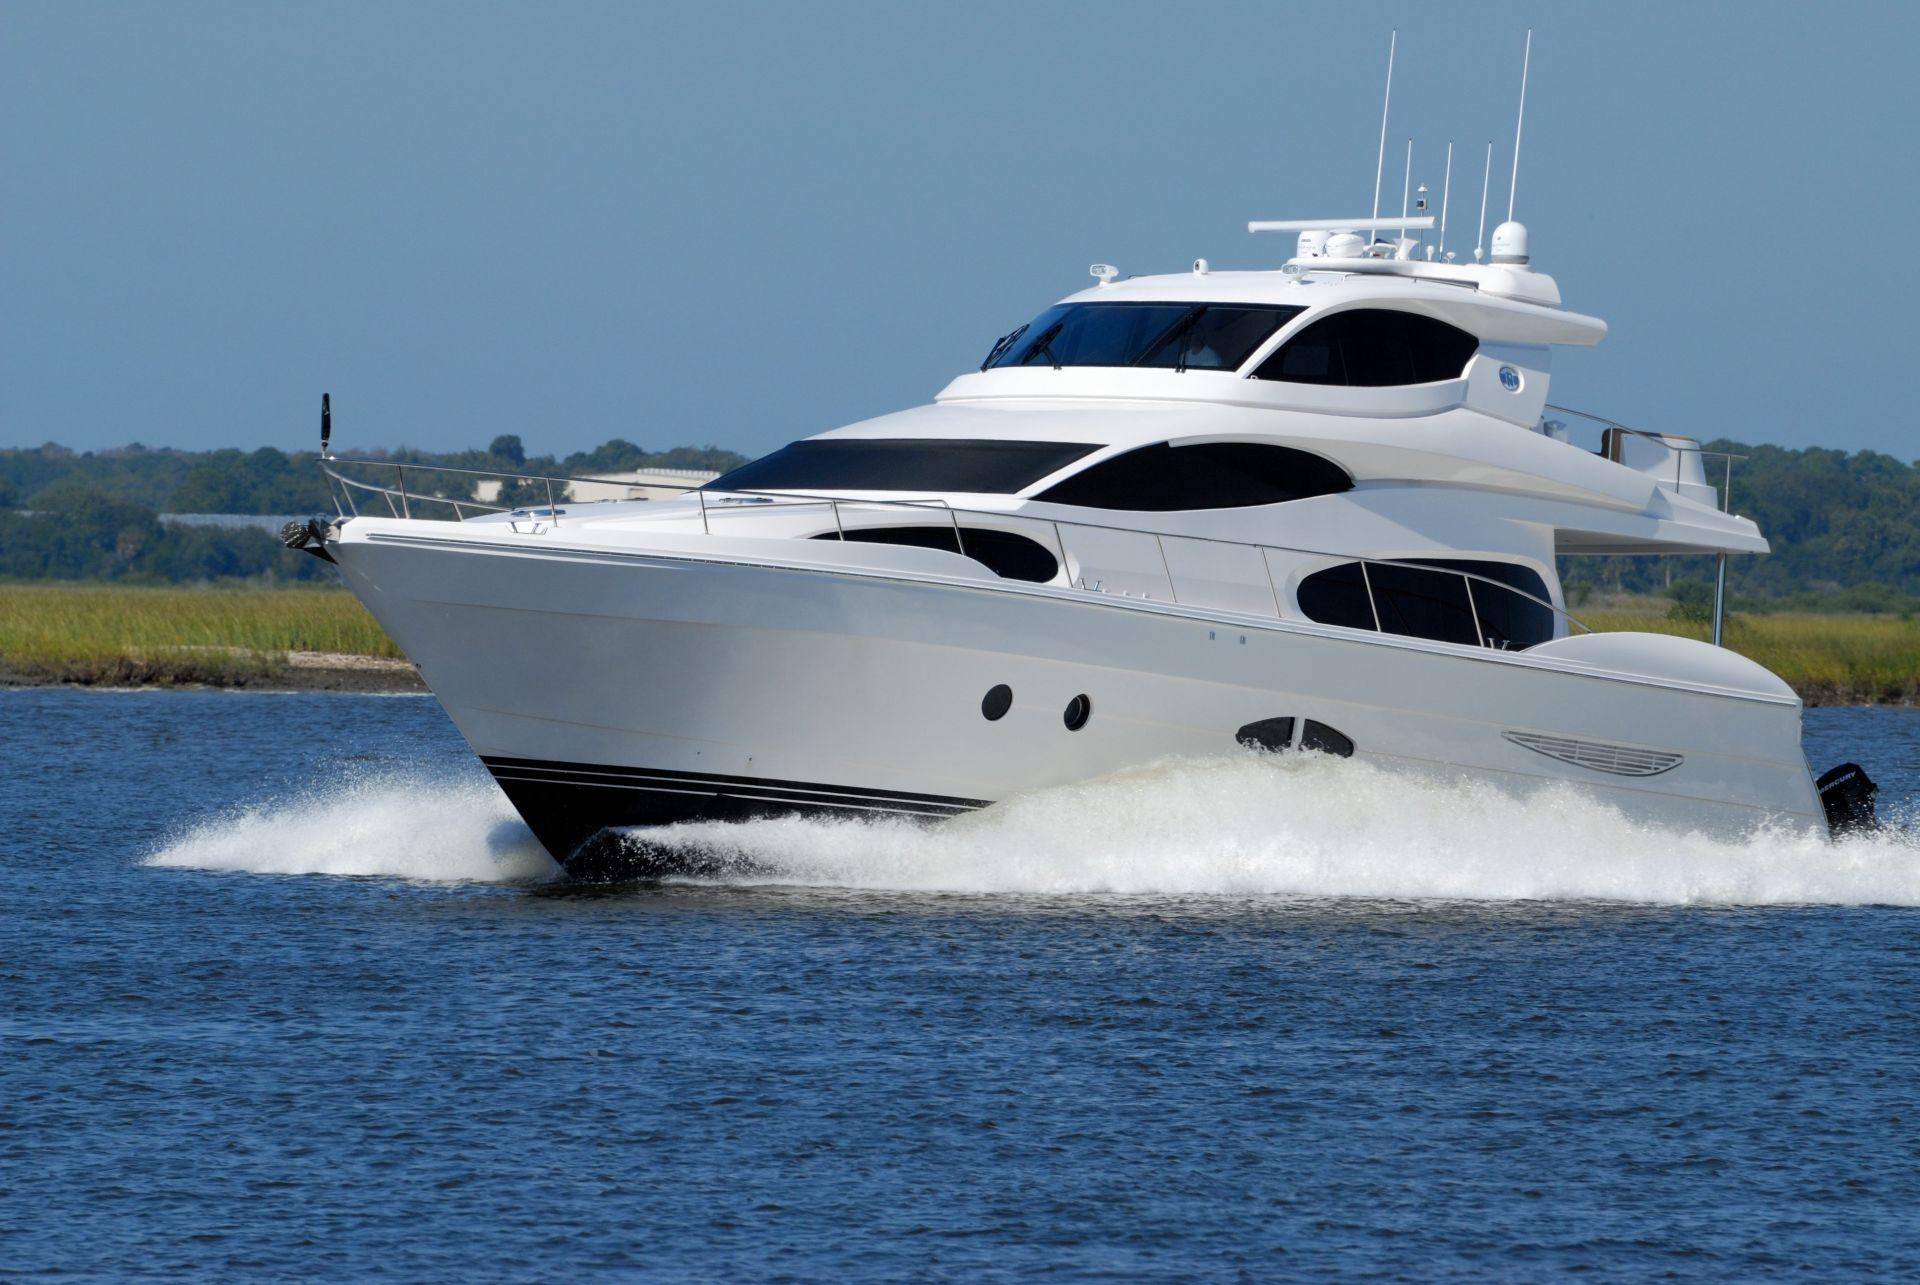 Boca Bayou Condos for Sale